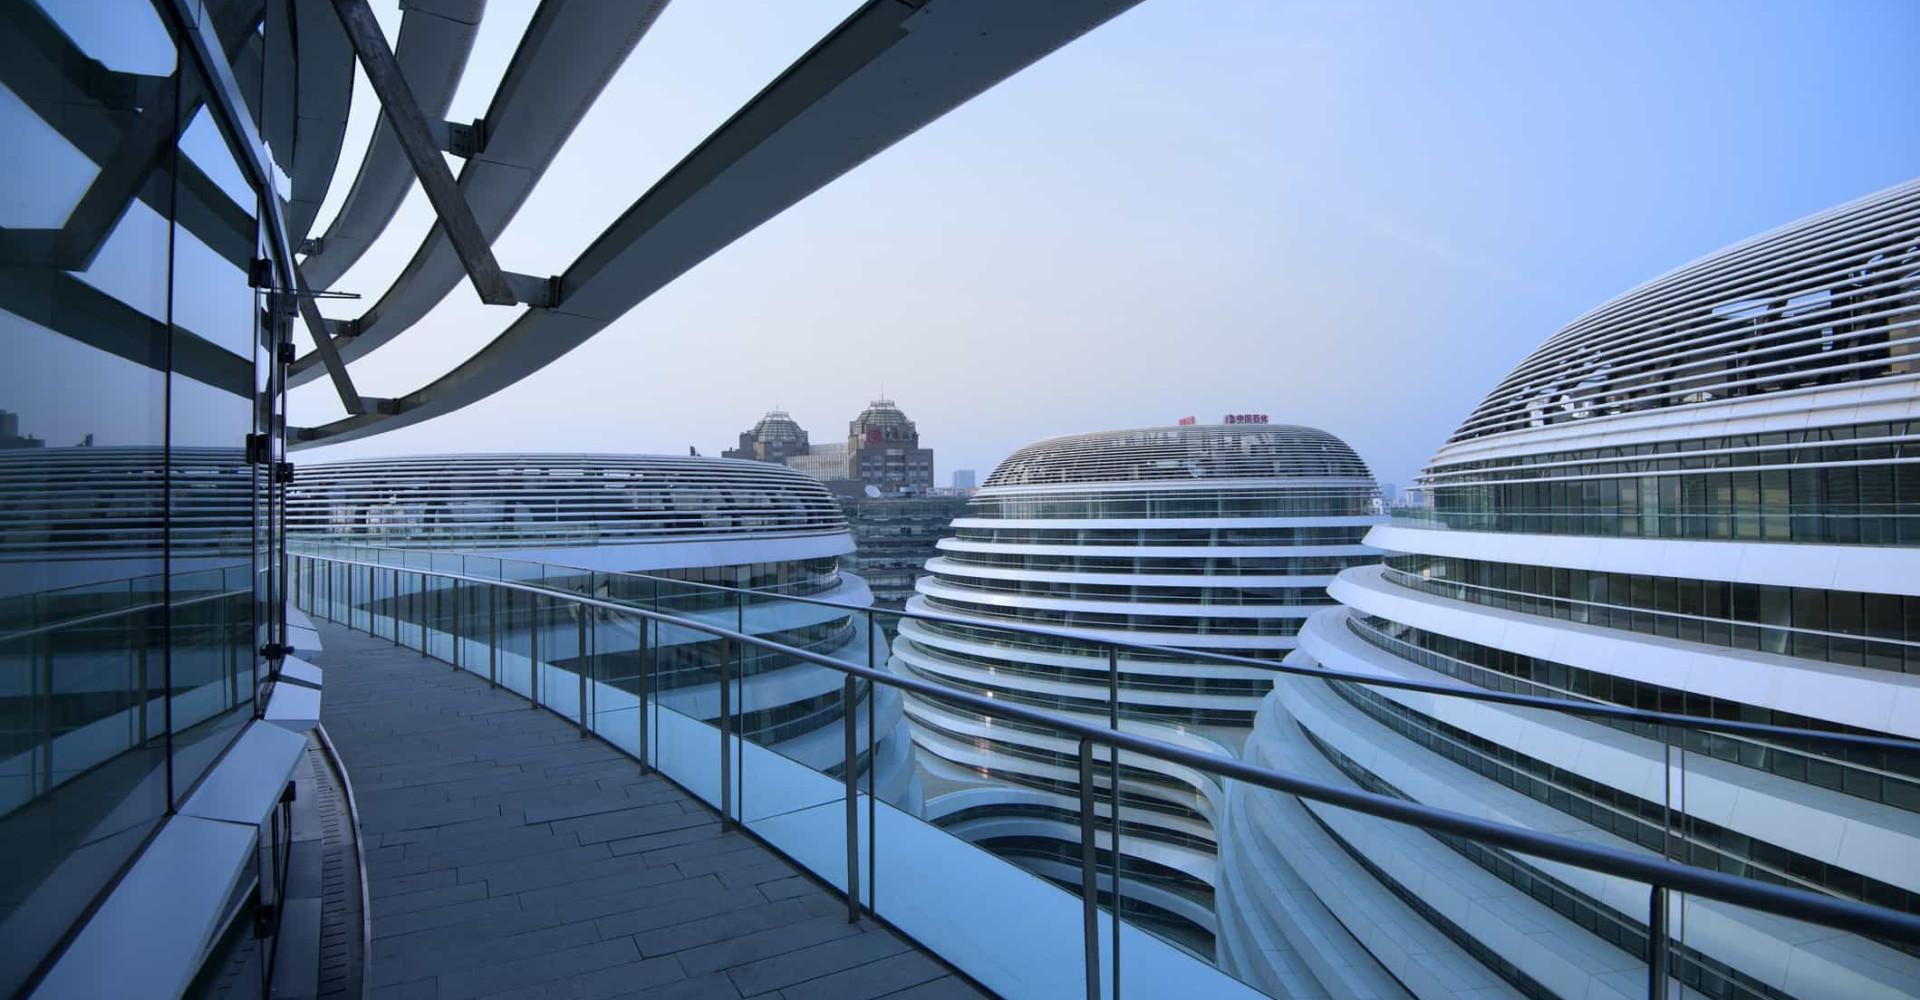 Time travel through the futuristic architecture of Zaha Hadid